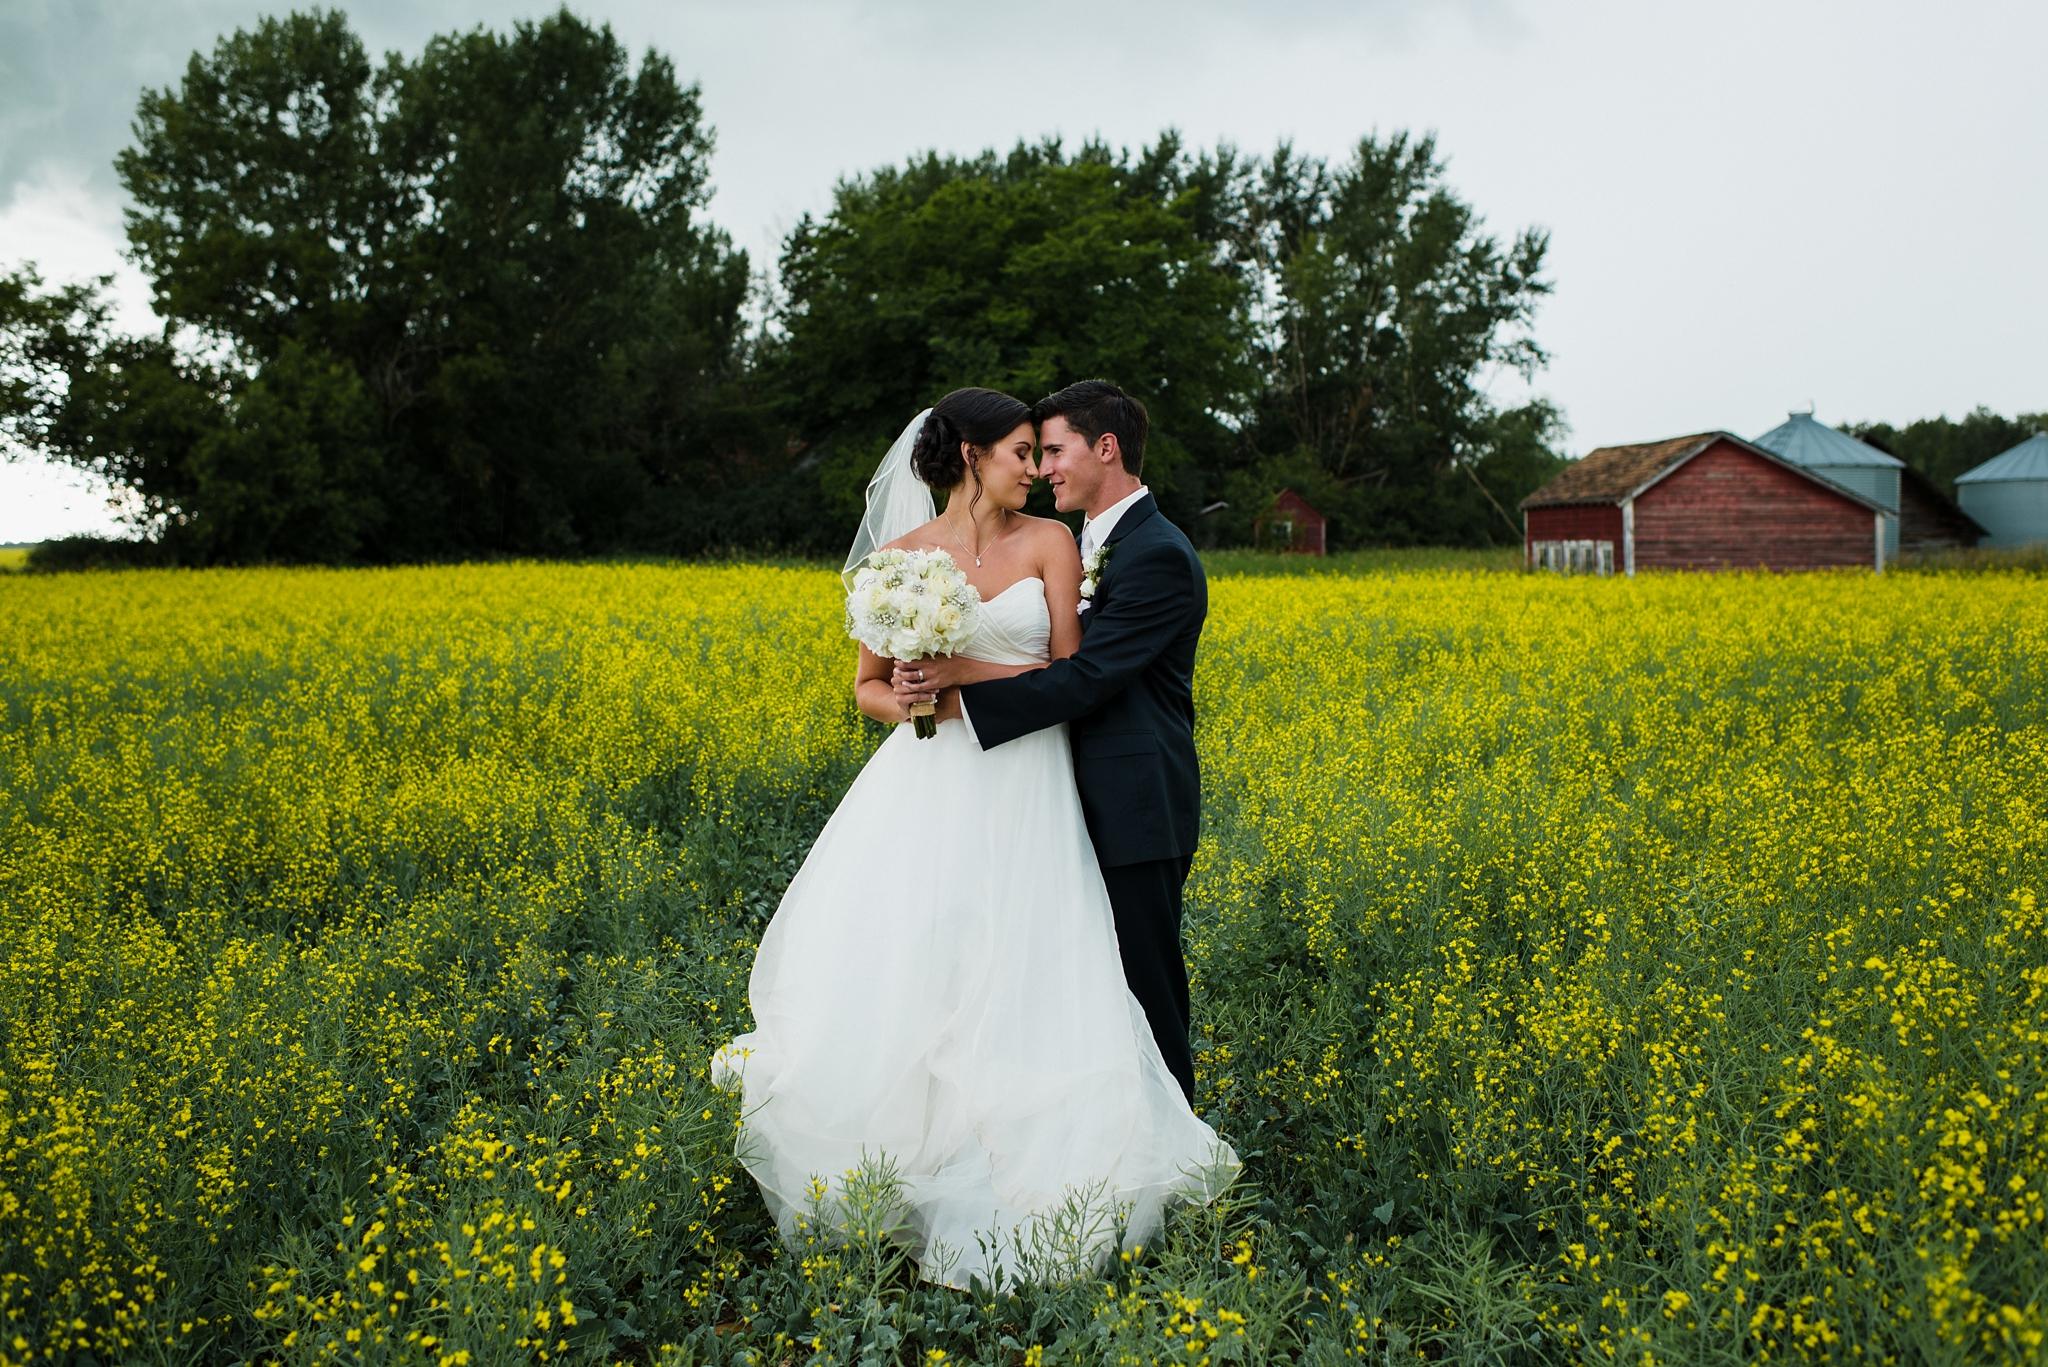 kaihla_tonai_intimate_wedding_elopement_photographer_0111